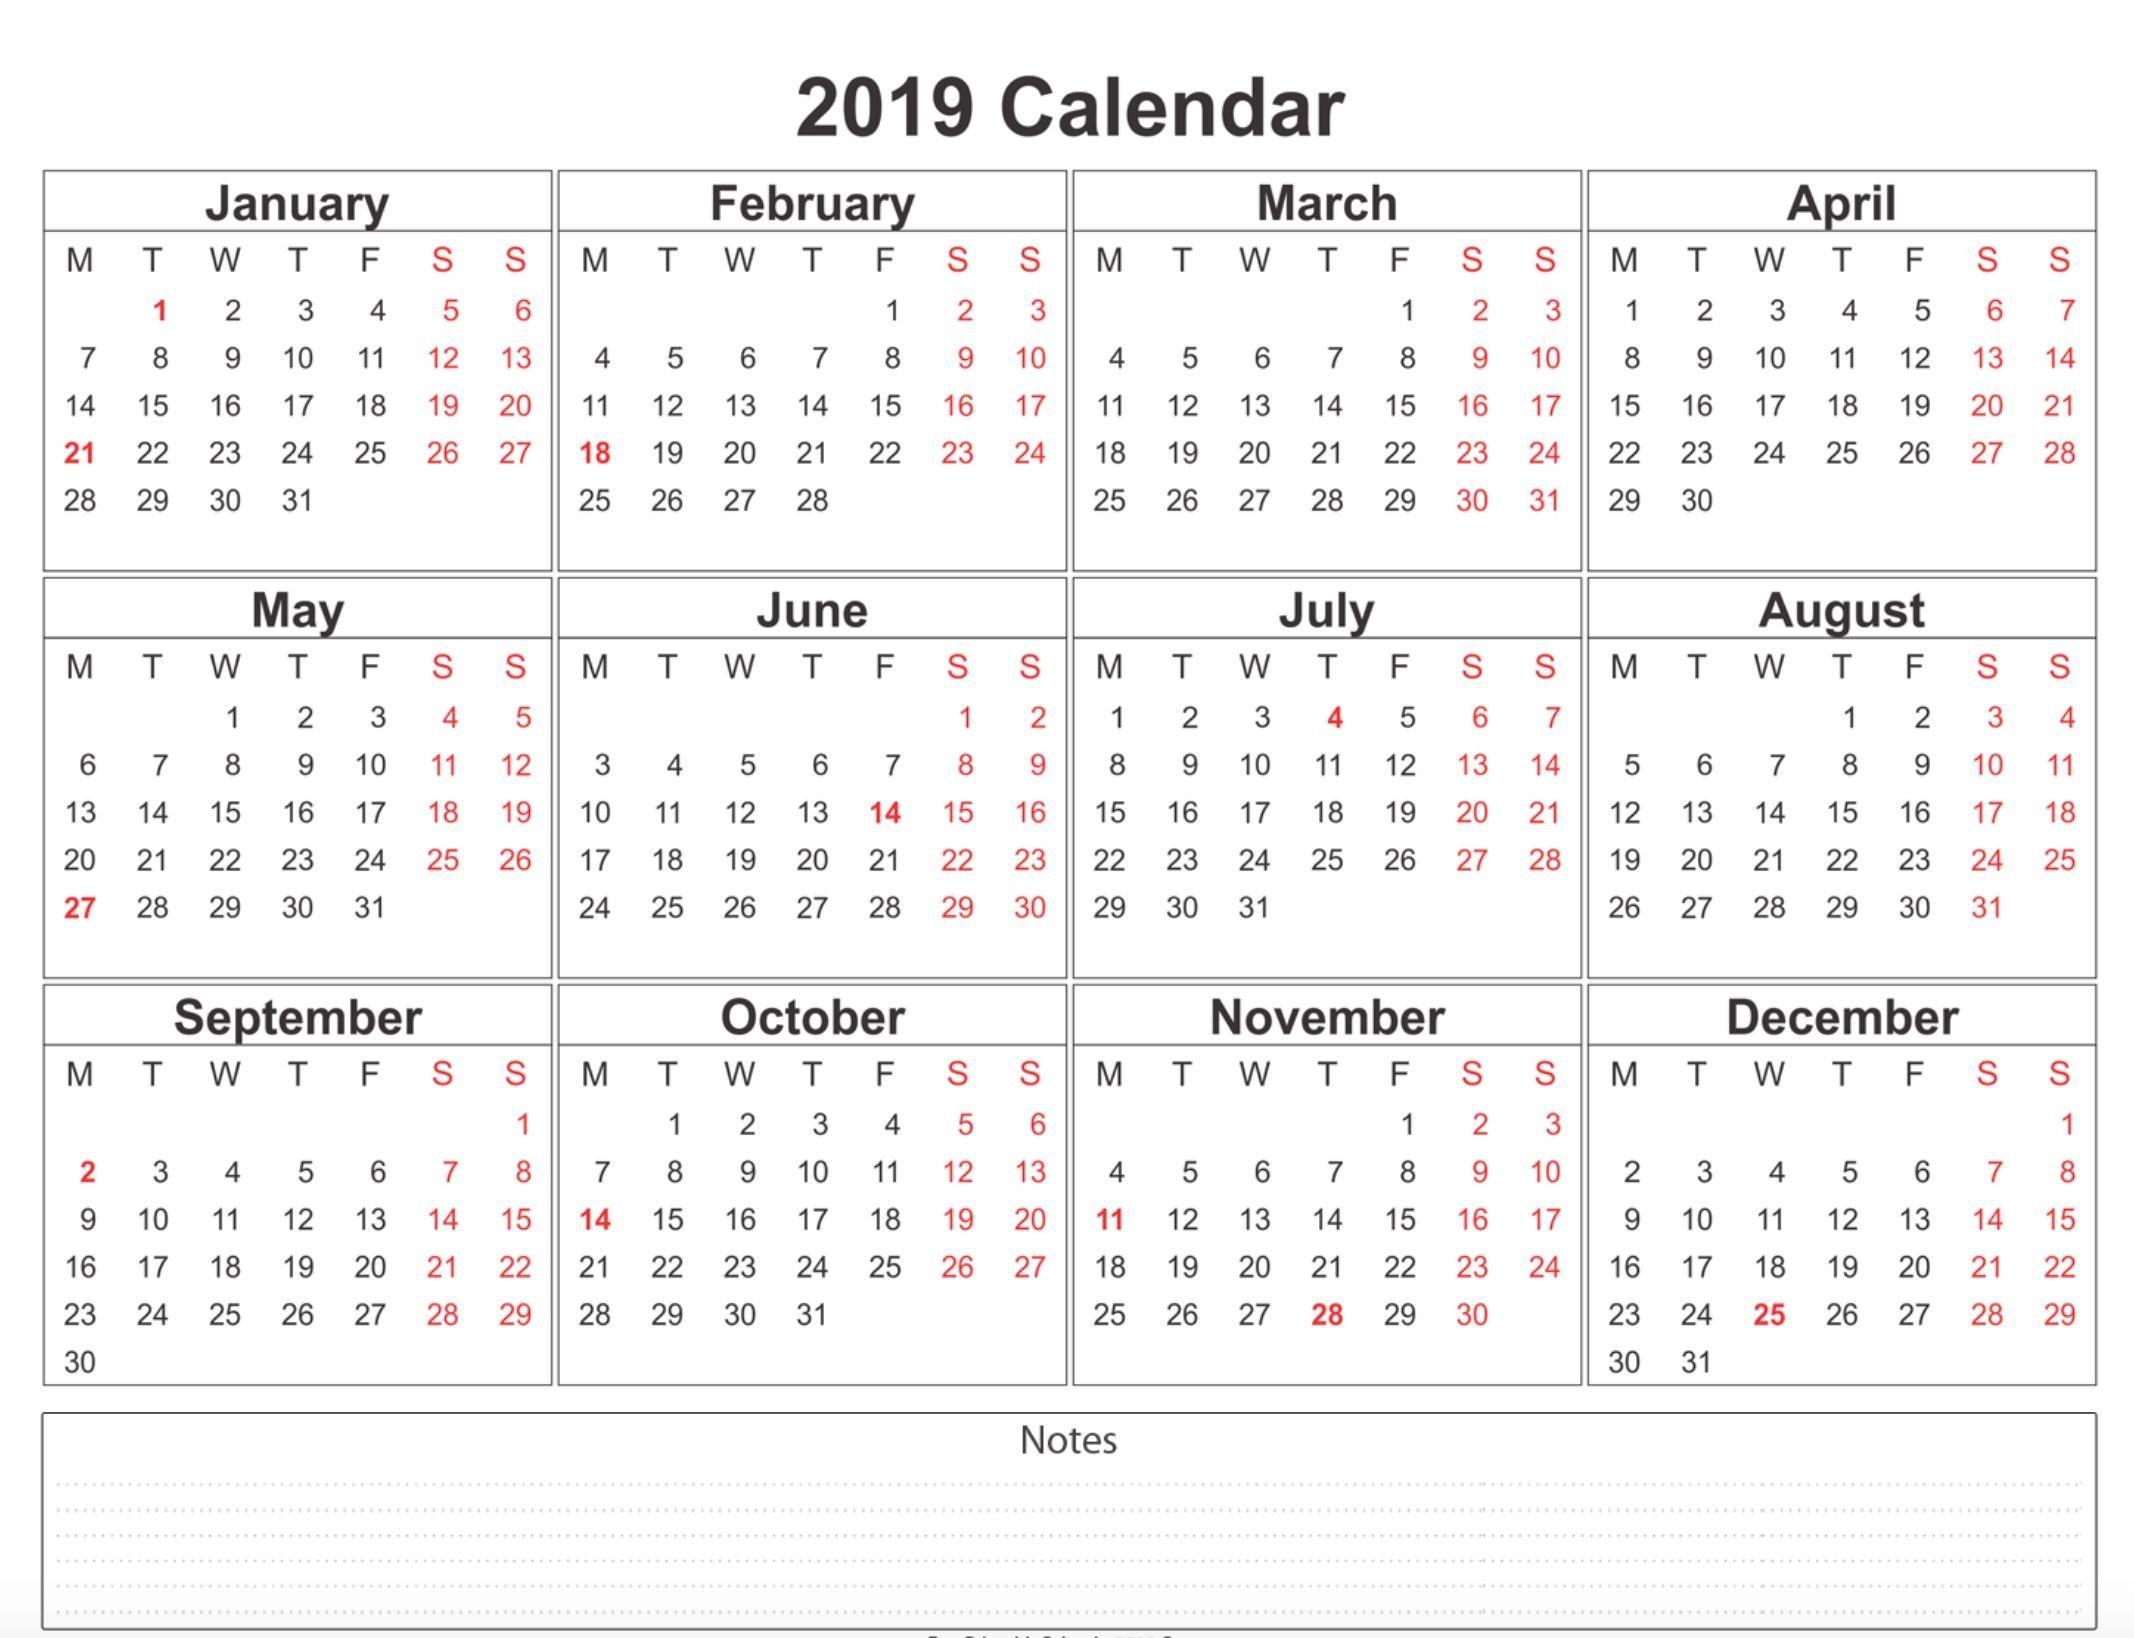 2019 Weekly Calendar Printable   2019 Calendars   12 Month Calendar for Blank 12 Month Calendar Printable